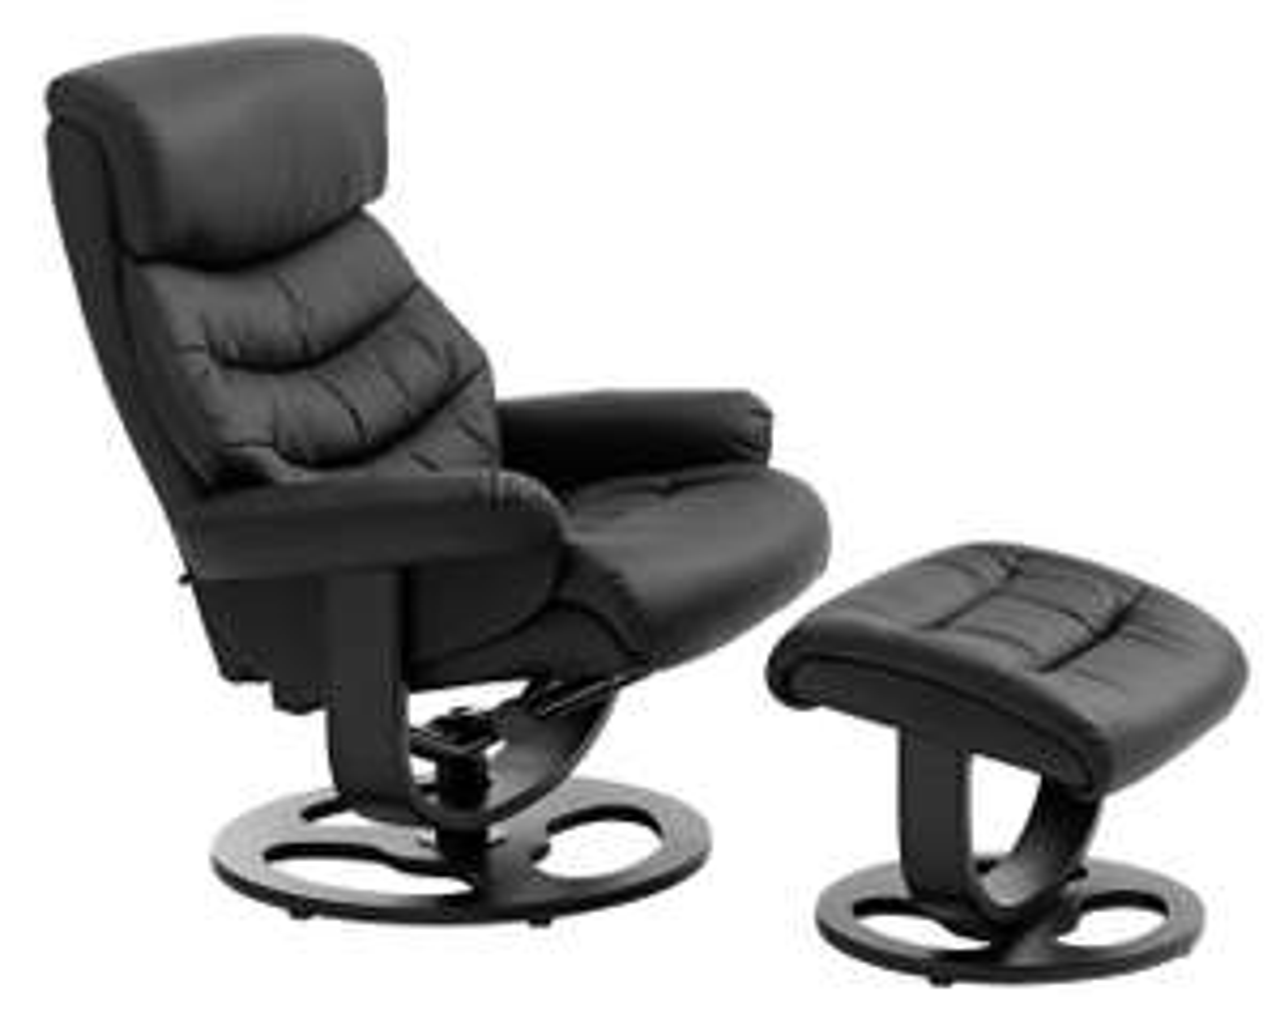 Fotel z podnóżkiem GANTRUP czarny @ Jysk